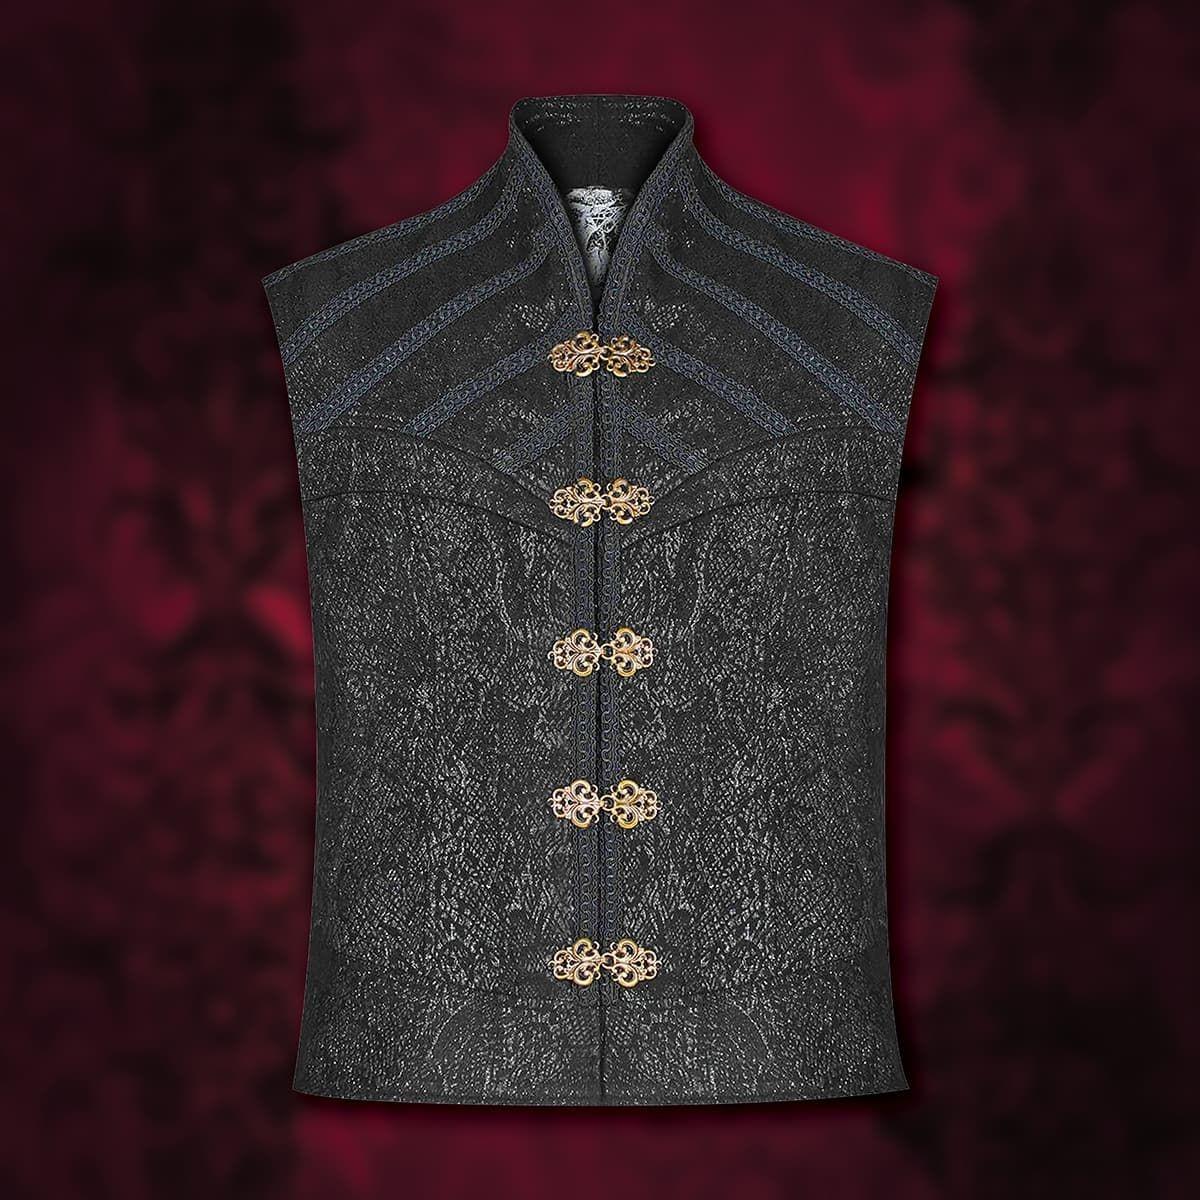 de Sade Black Jacquard Waistcoat Vest